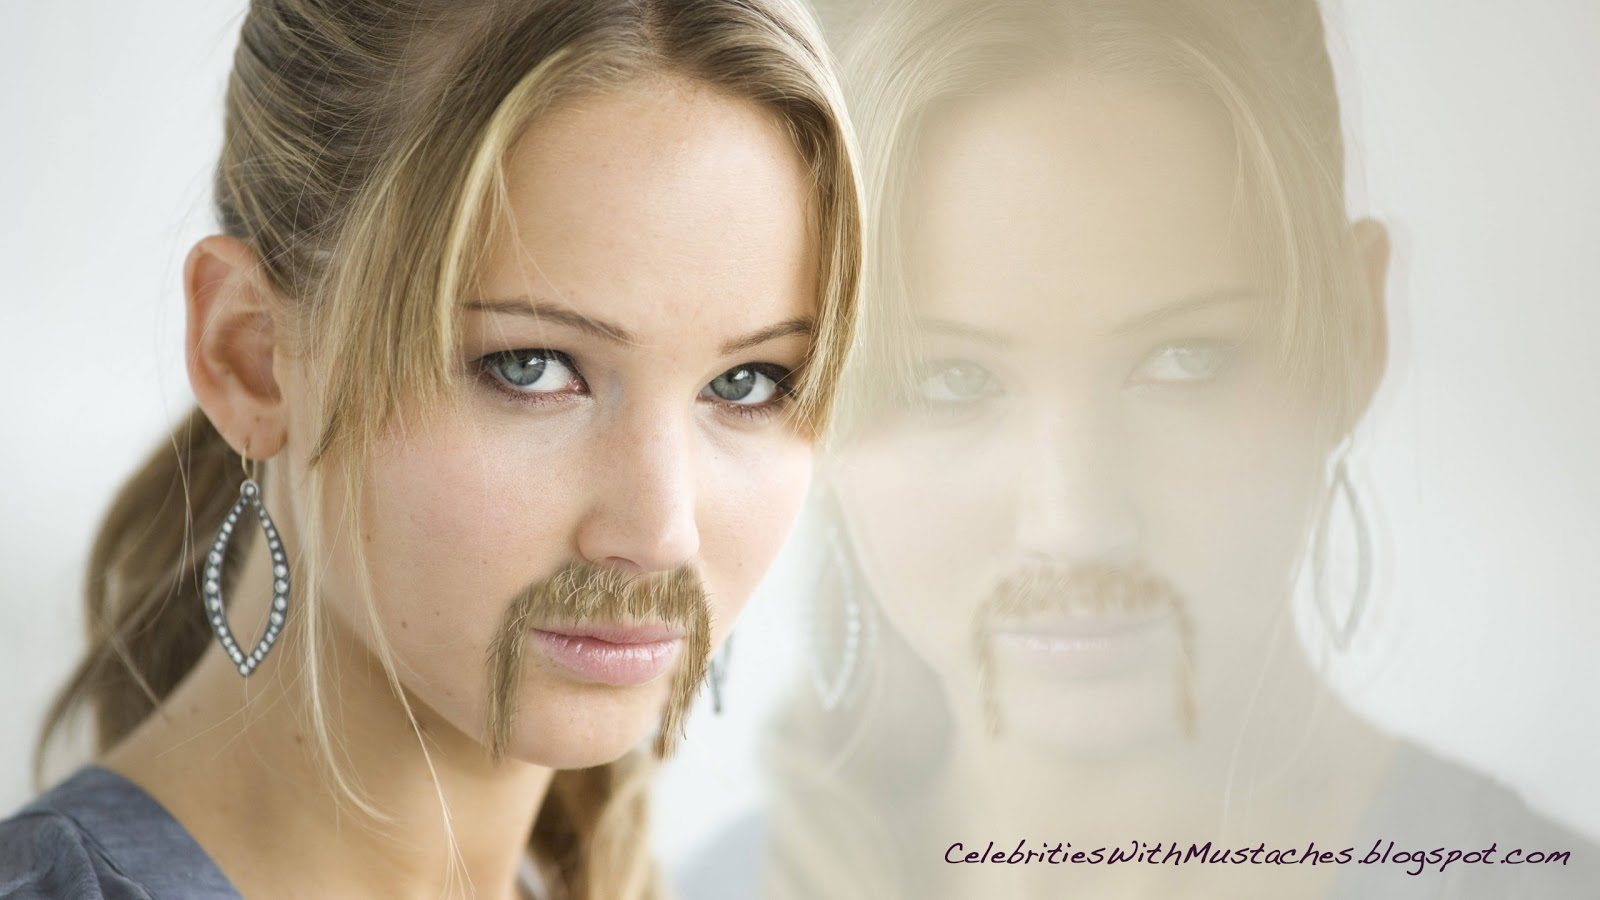 Jennifer Lawrence Ponders her Mustache